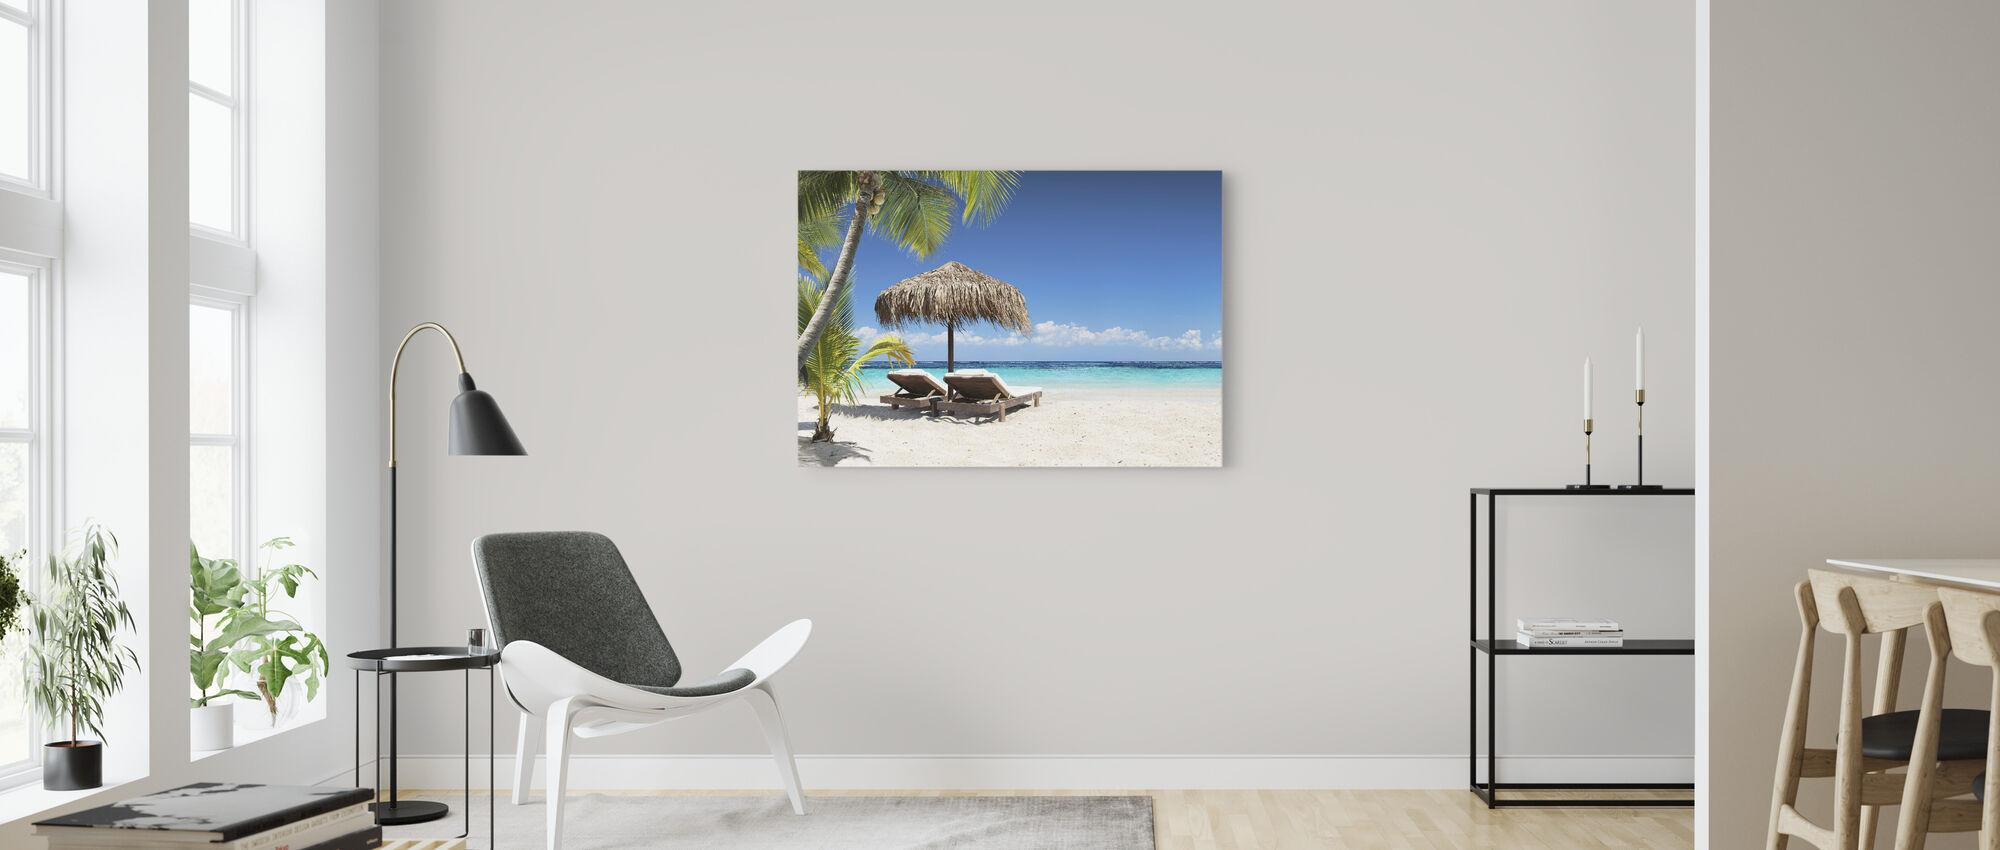 Coral Beach - Canvastaulu - Olohuone